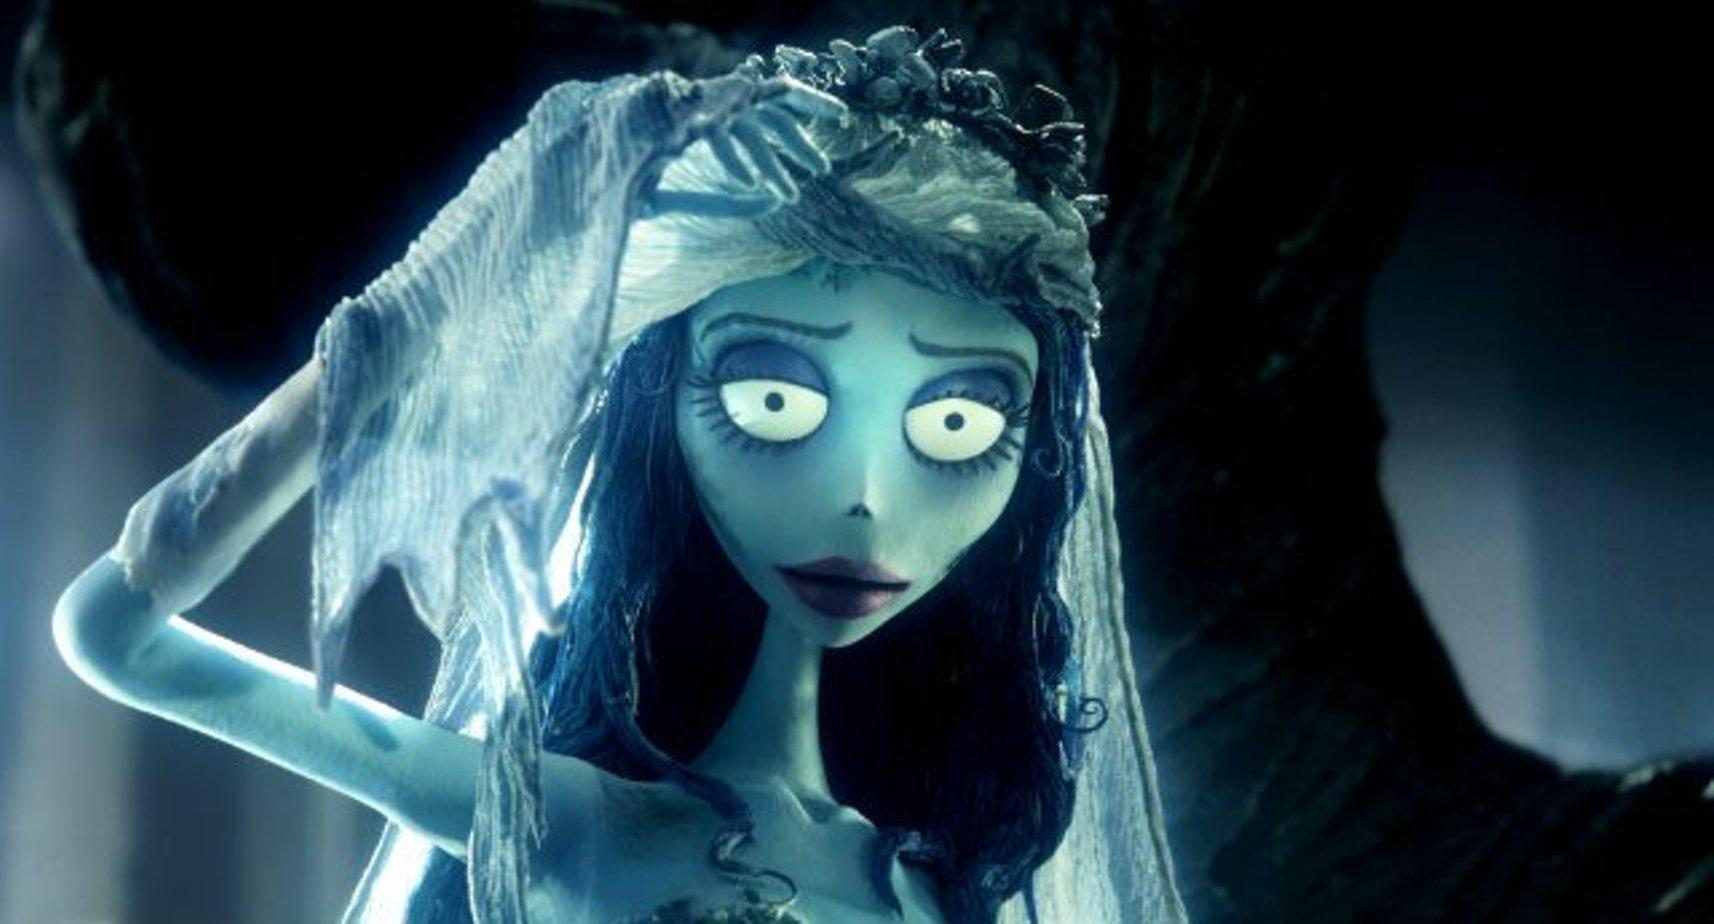 Fotos del cadaver dela novia la pelicula